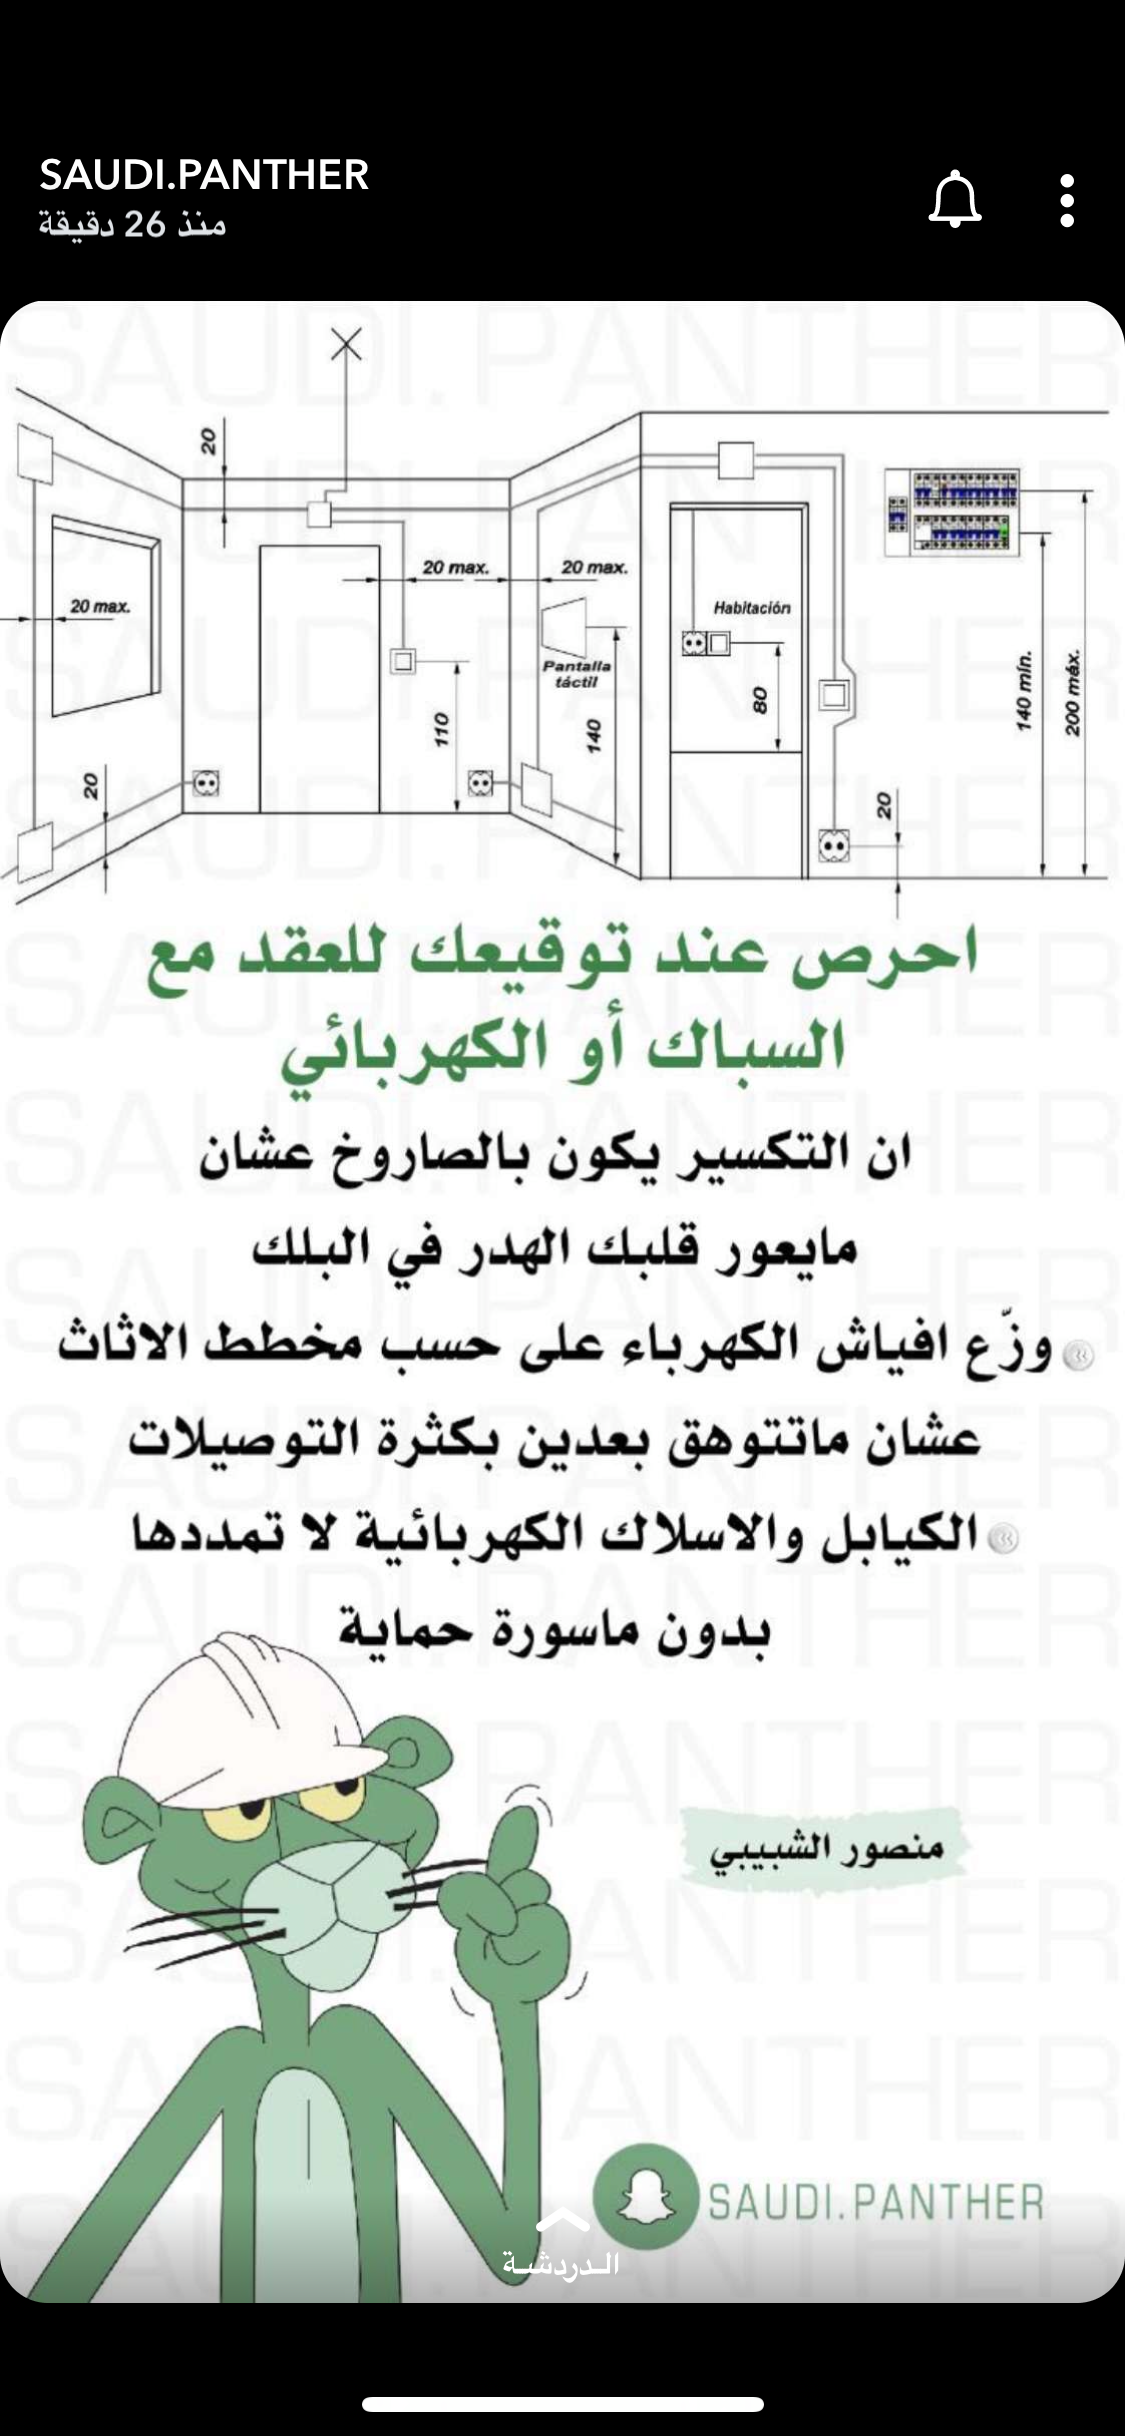 Pin By Bsmh On معلومات للبناء Casual Home Decor Home Room Design Home Goods Decor